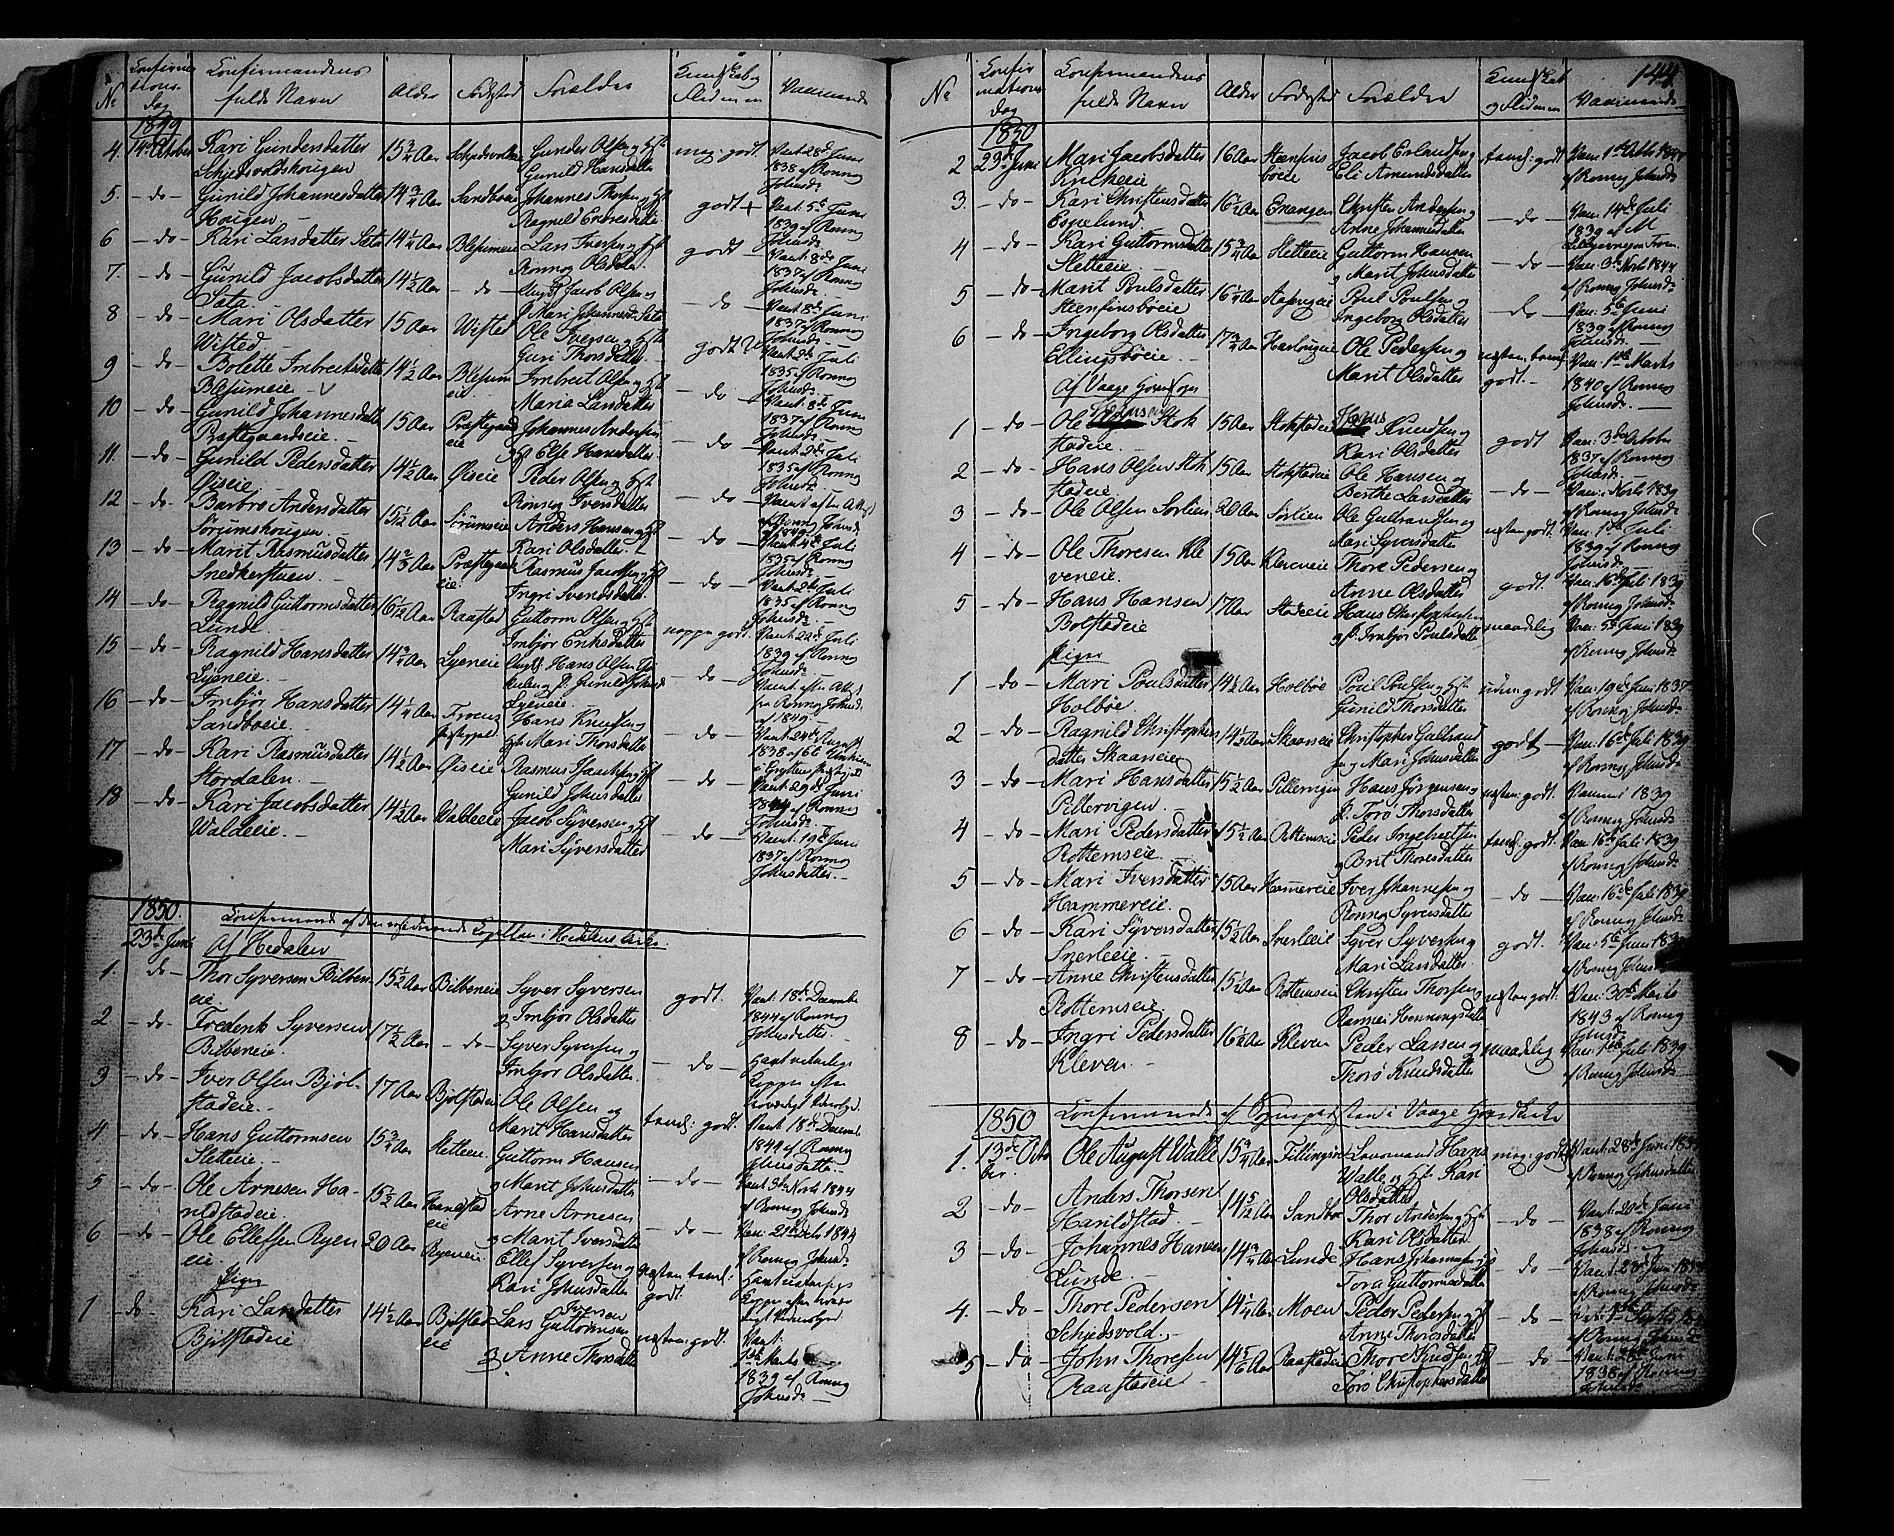 SAH, Vågå prestekontor, Ministerialbok nr. 5 /1, 1842-1856, s. 144